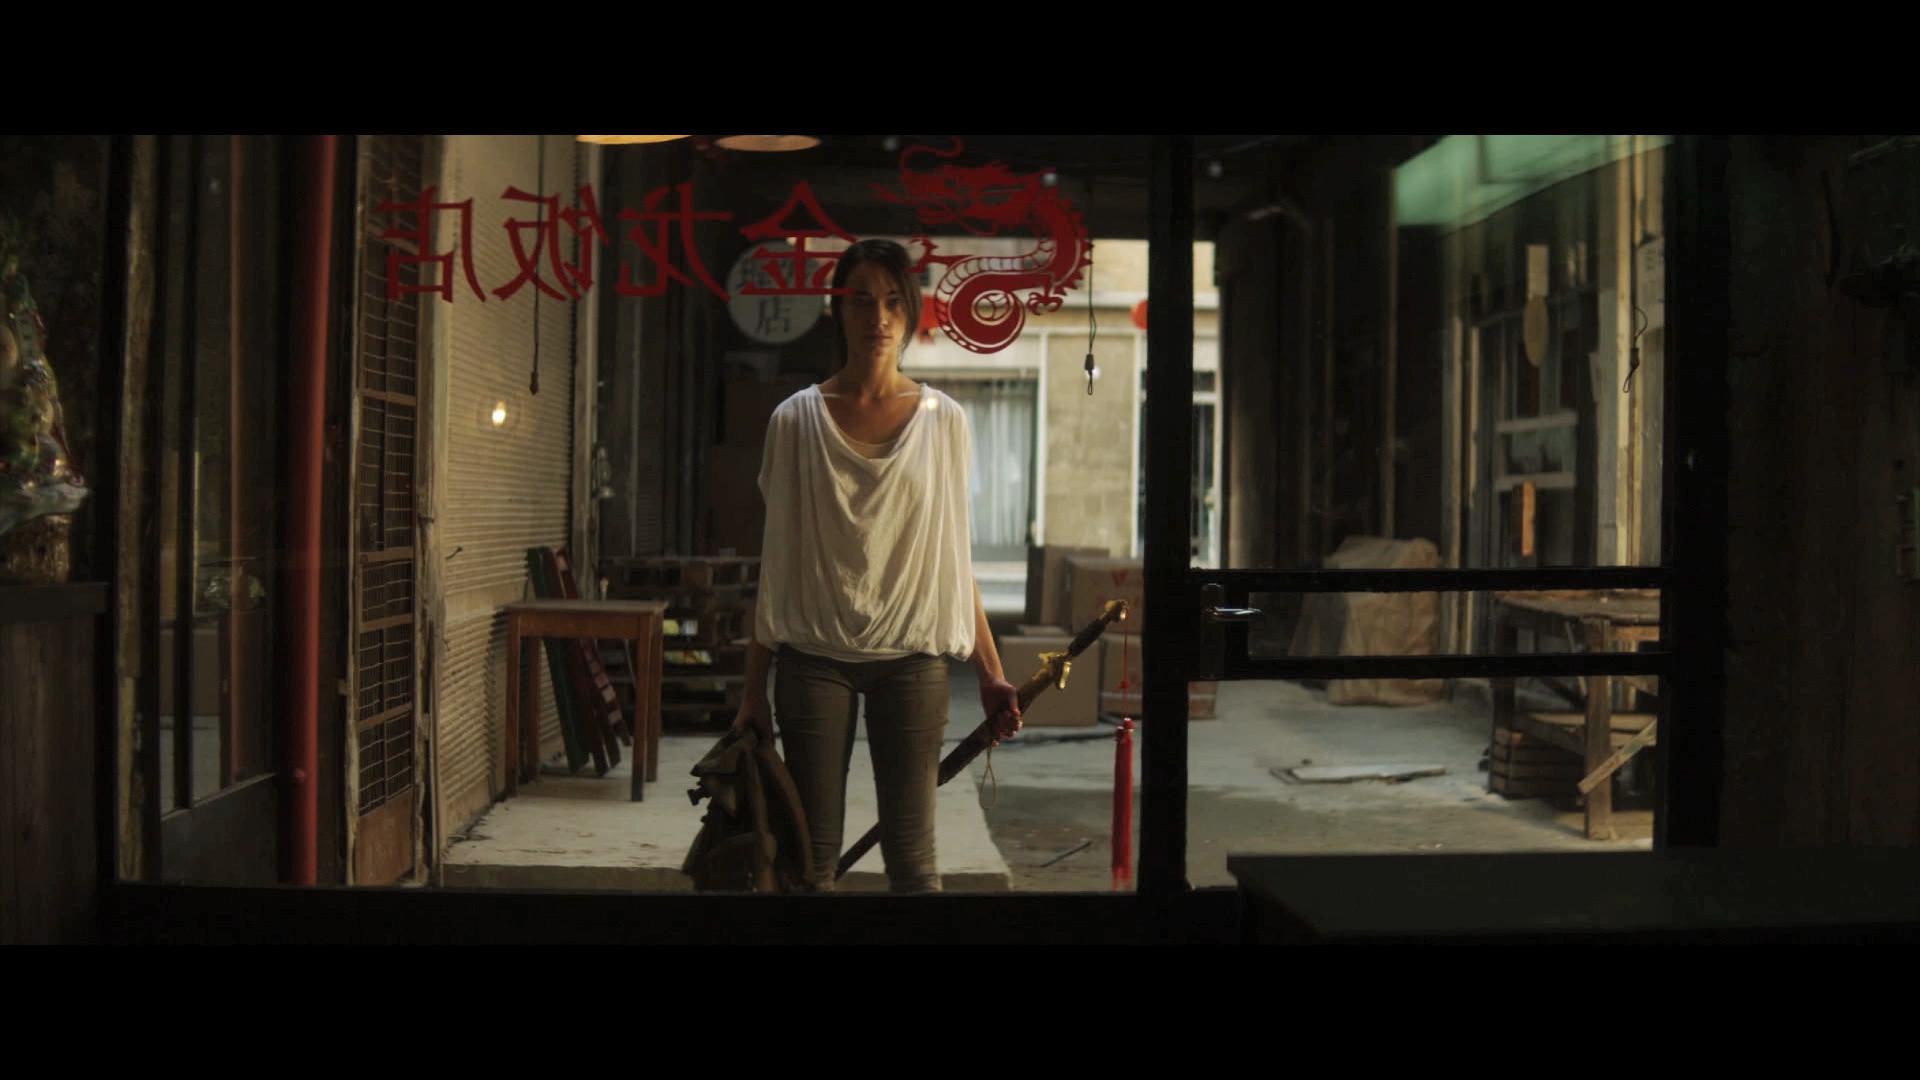 Chinatown - Τα Τρία Καταφύγια/ ΜΕΓΑΛΟΥ ΜΗΚΟΥΣ